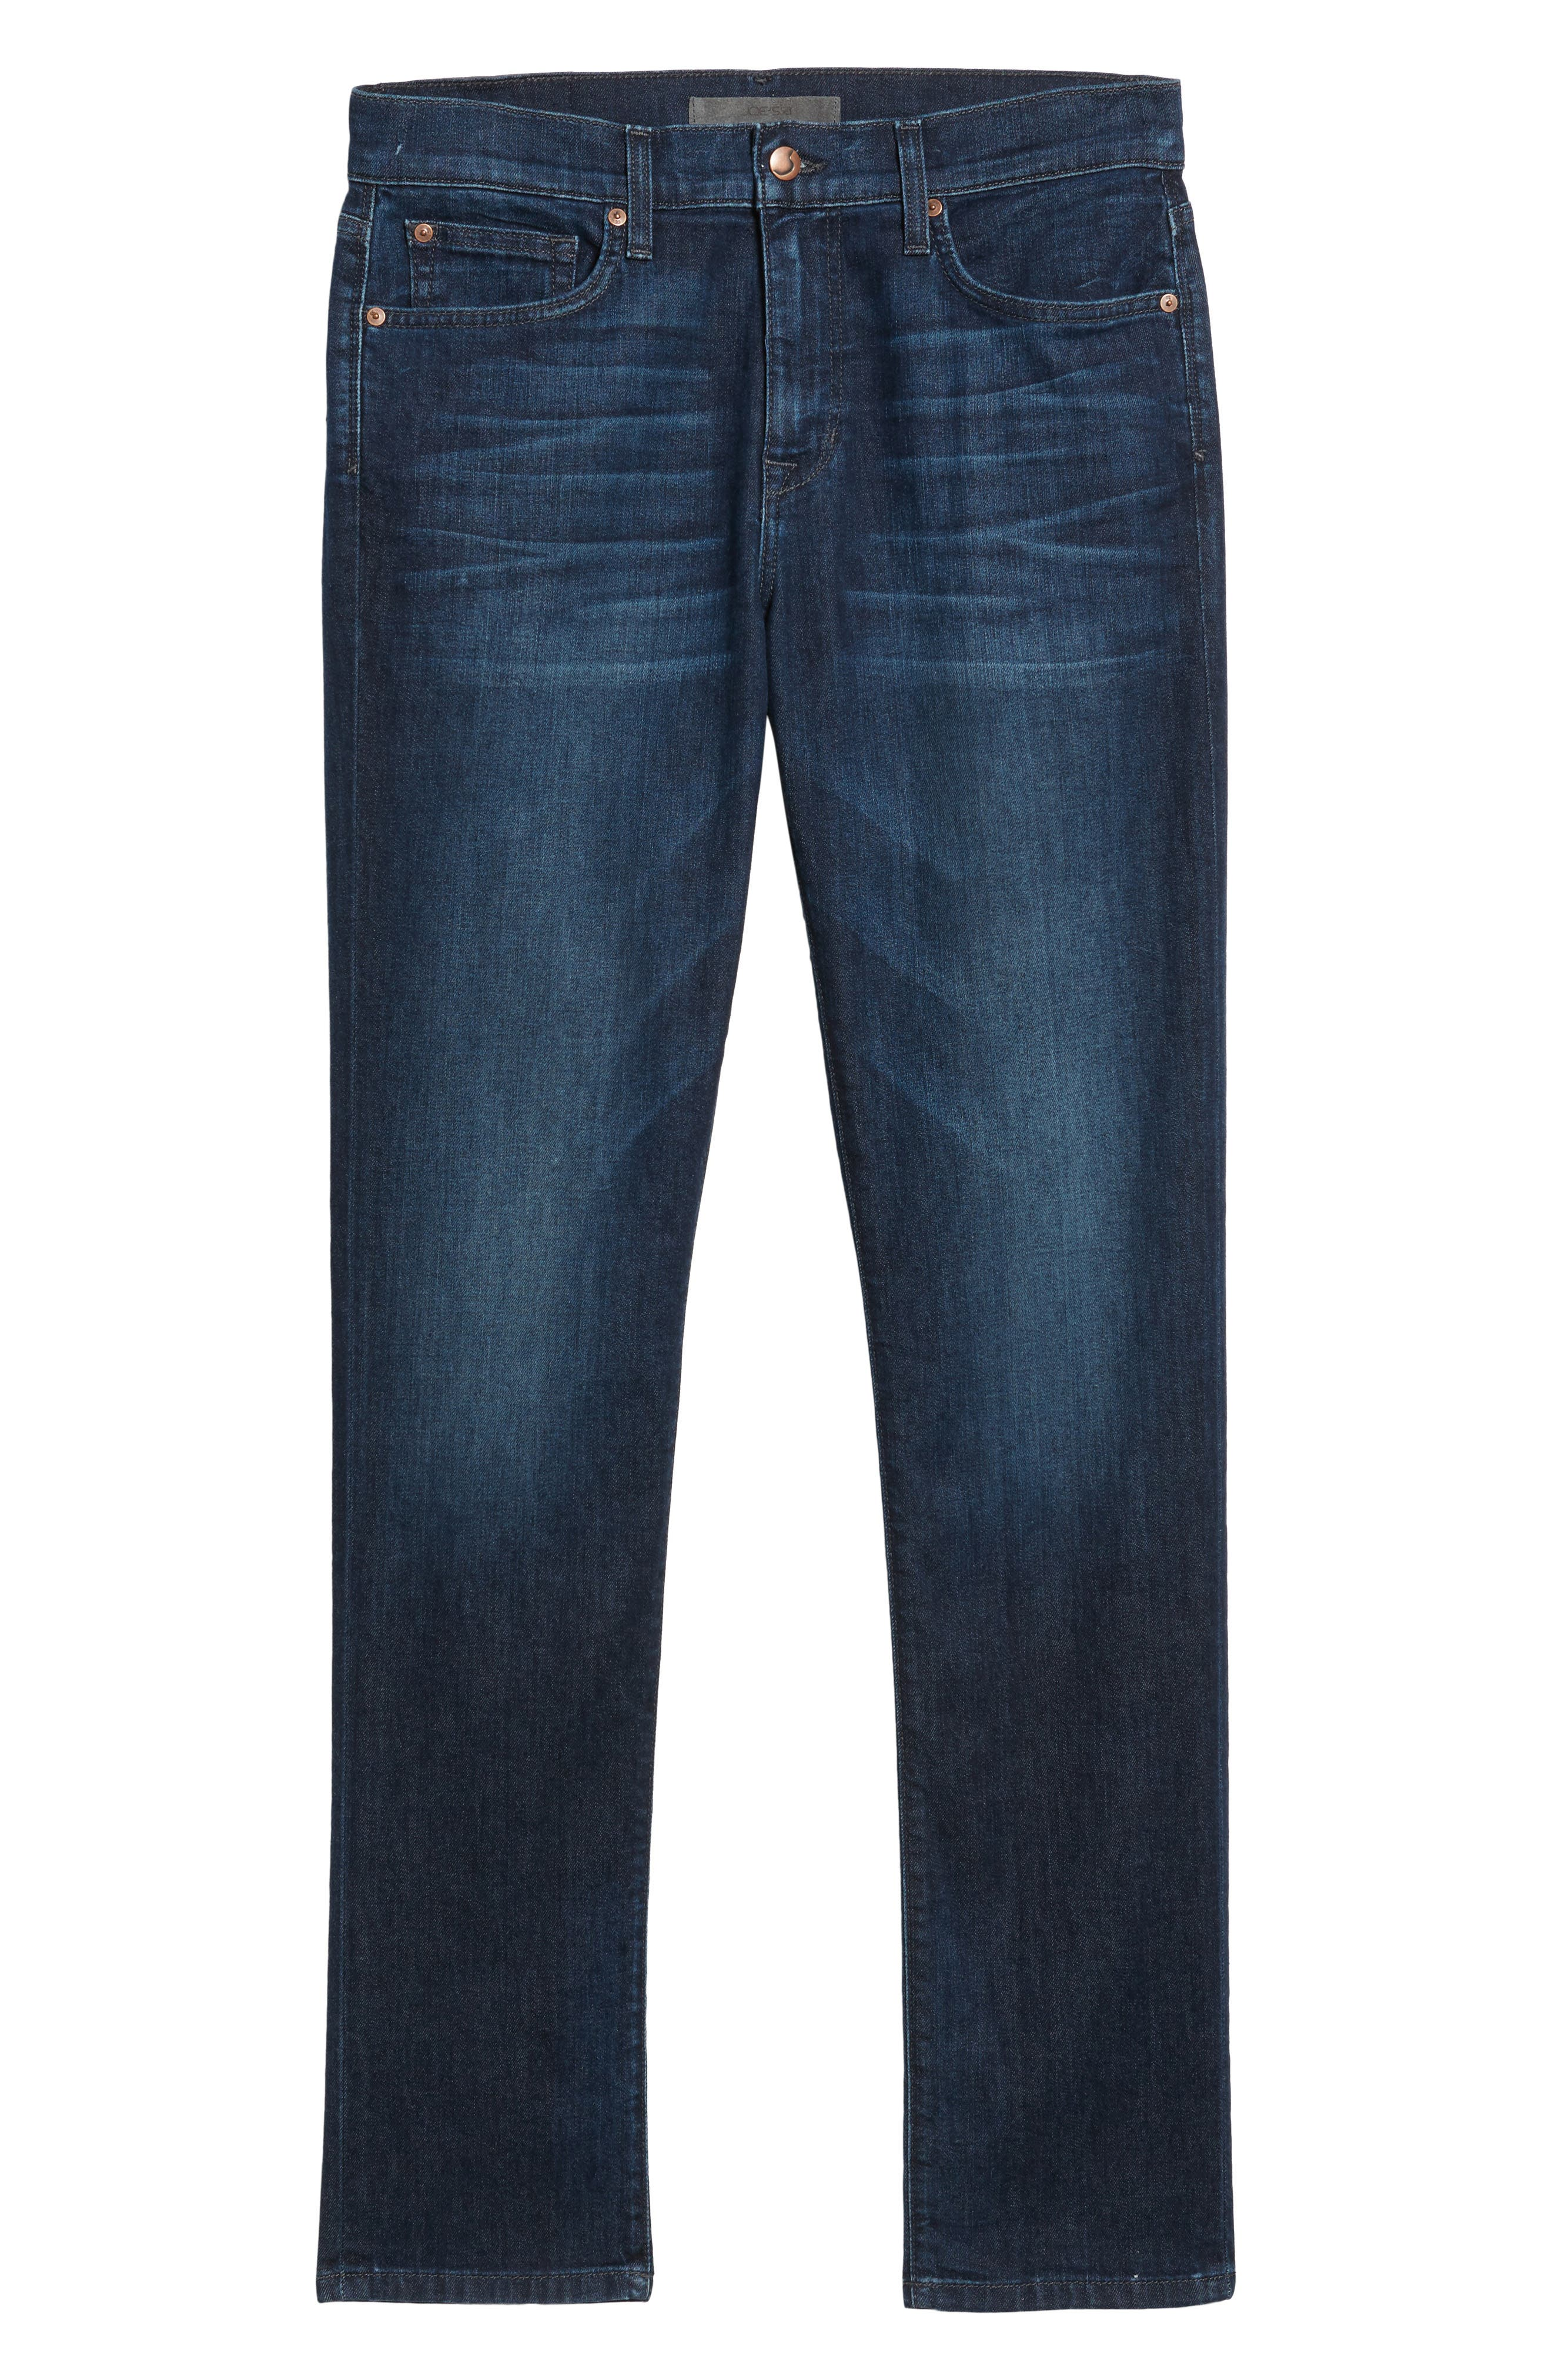 Slim Fit Jeans,                             Alternate thumbnail 6, color,                             Izaak